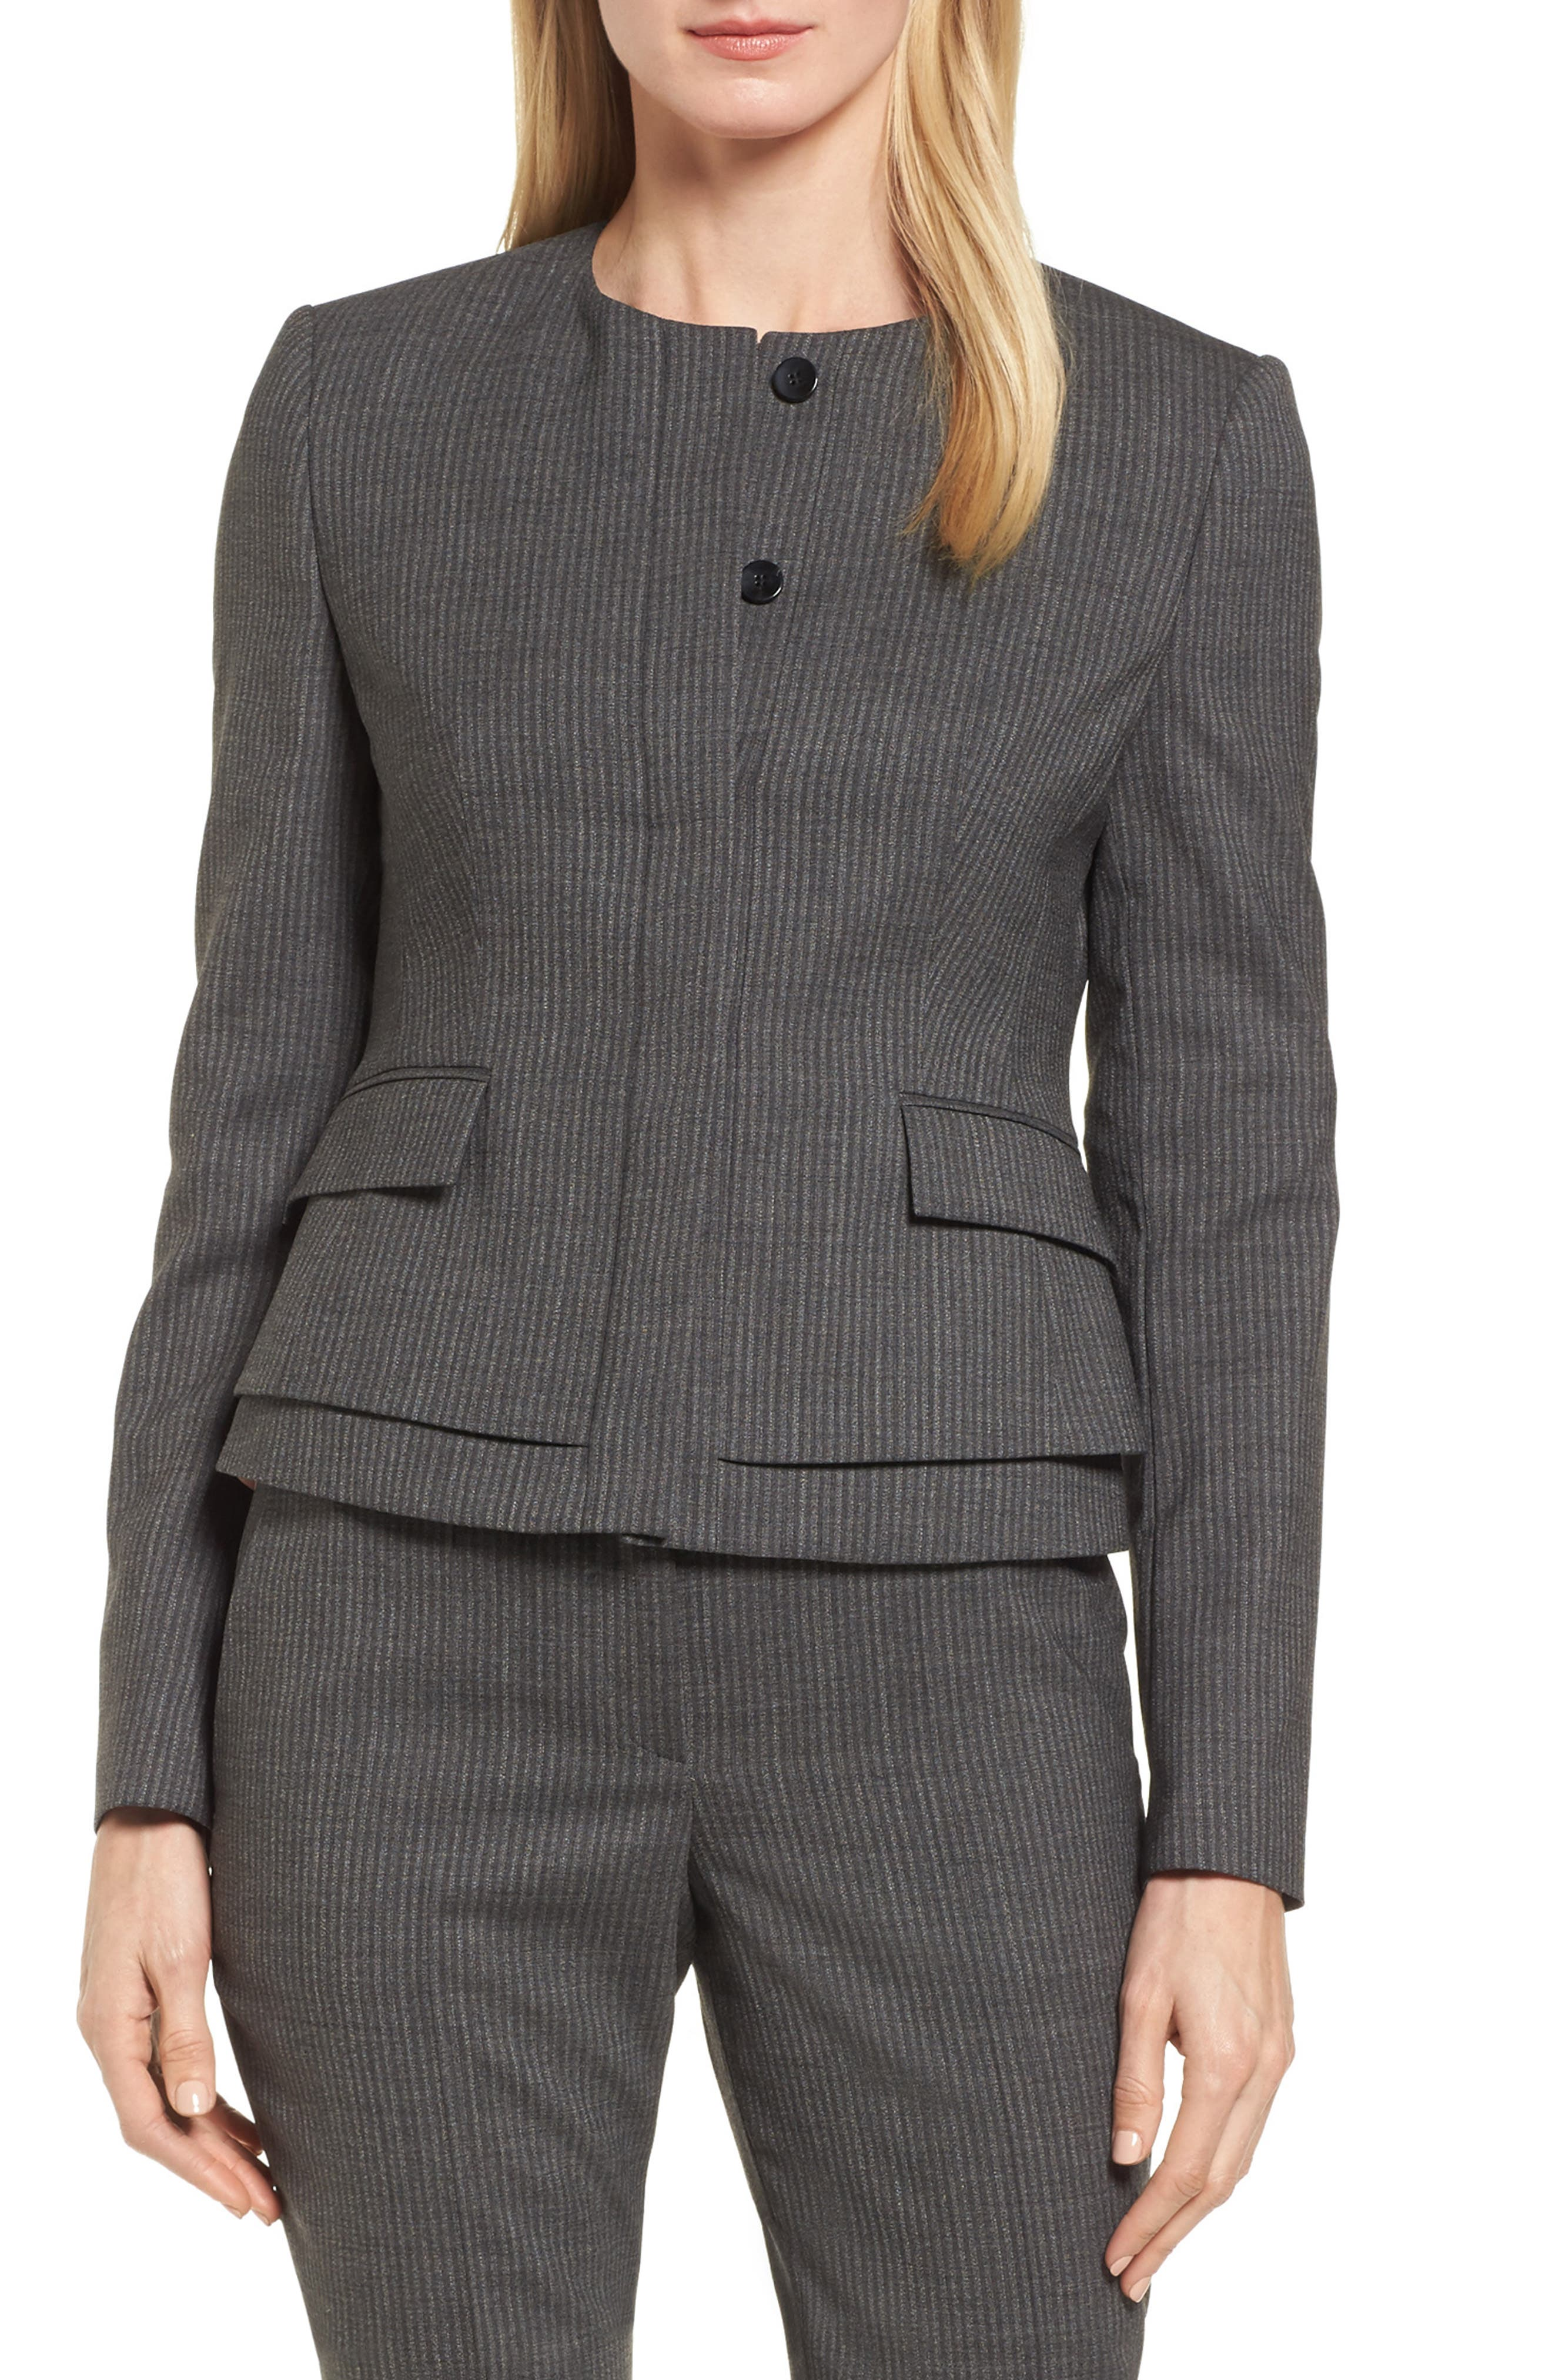 Jasyma Stripe Wool Suit Jacket,                             Main thumbnail 1, color,                             Dark Grey Fantasy